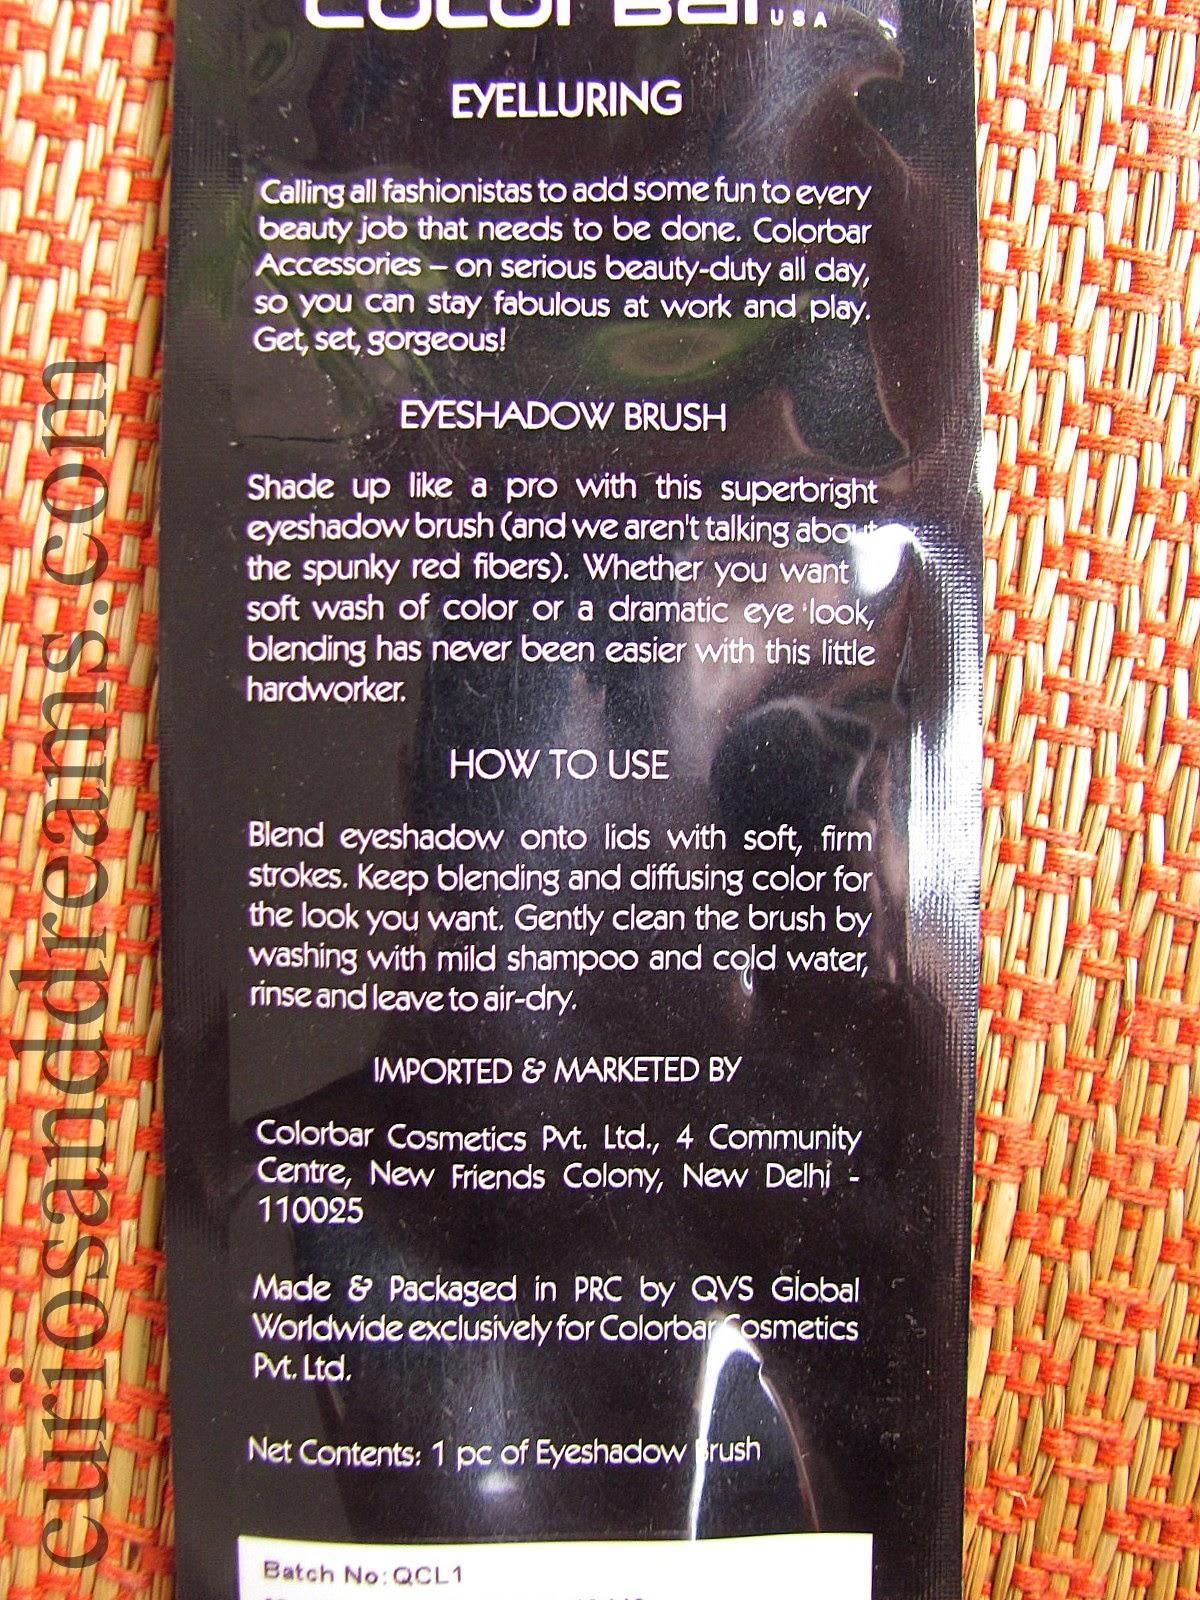 Colorbar Eyelluring Eyeshadow Brush Review